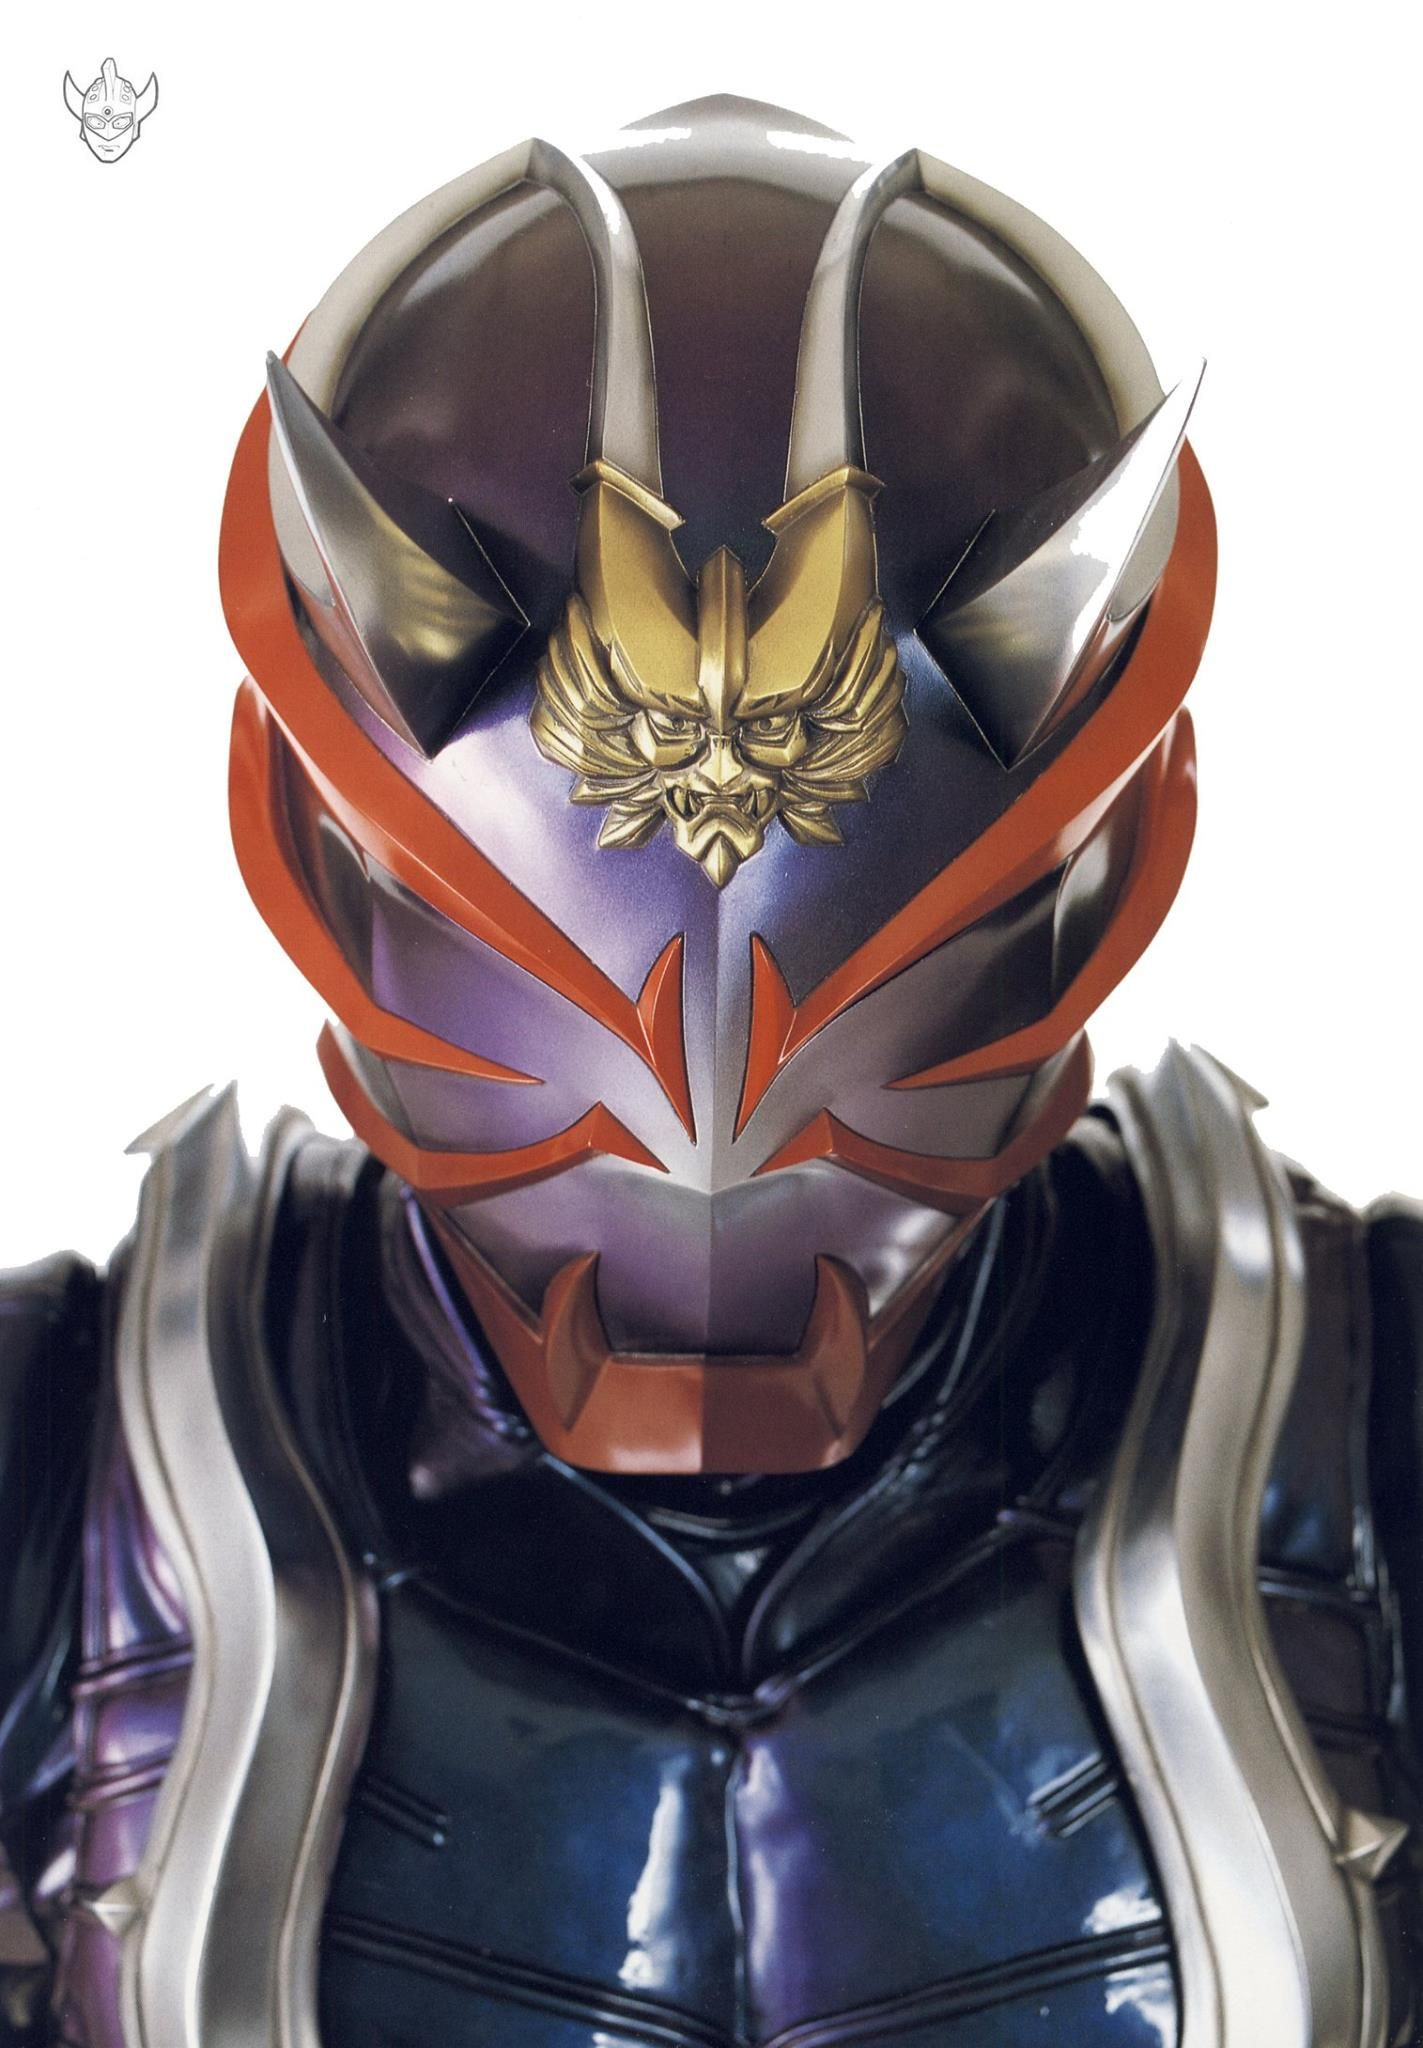 「Kamen Rider Hibiki」おしゃれまとめの人気アイデア Pinterest Pat Mayer(画像